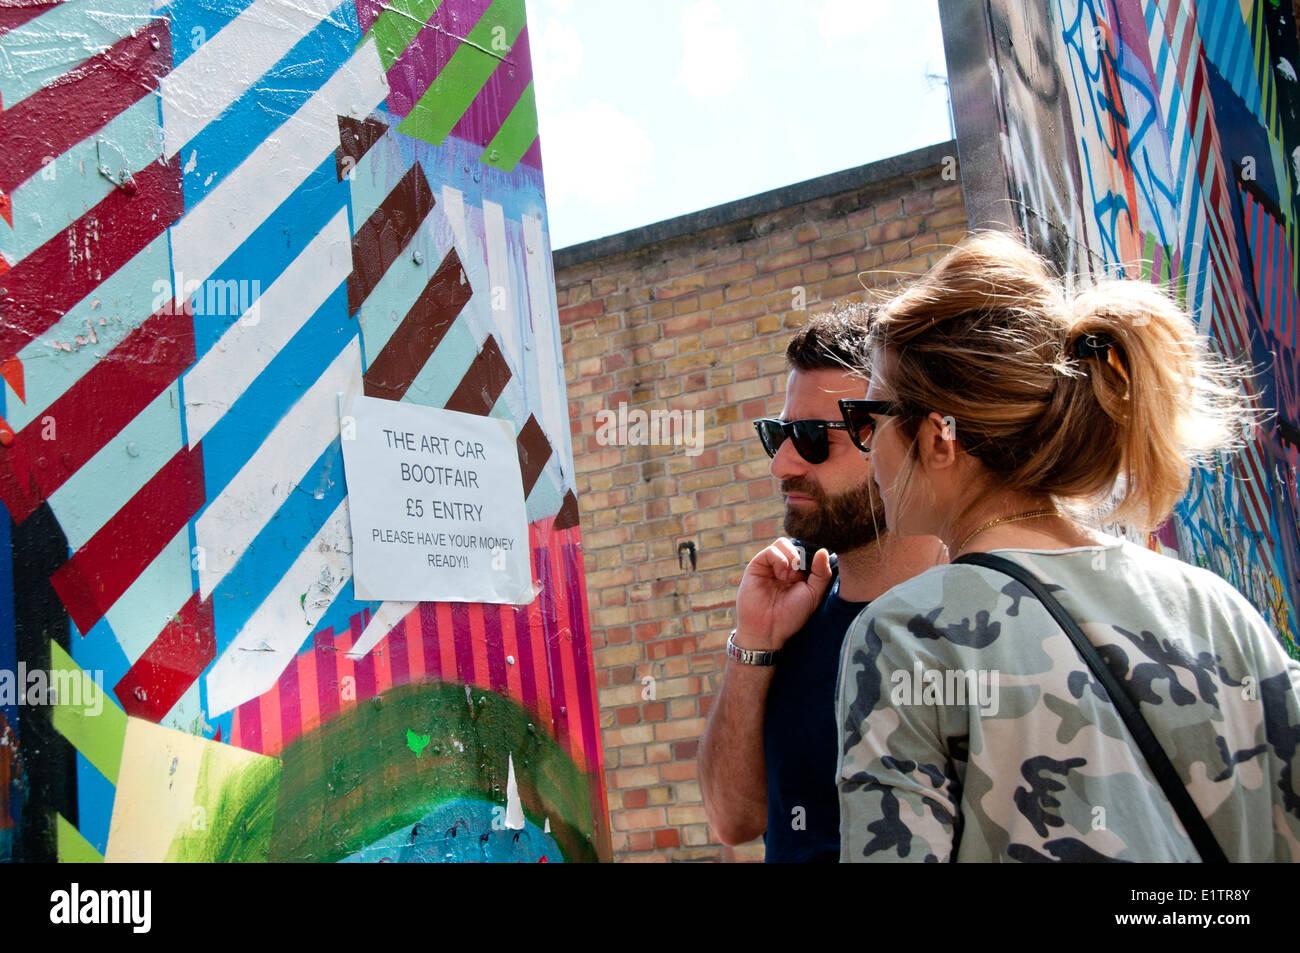 Buxton Street off Brick Lane, East London. June 8th 2014. Vauxhall Art Car Boot Fair - Stock Image